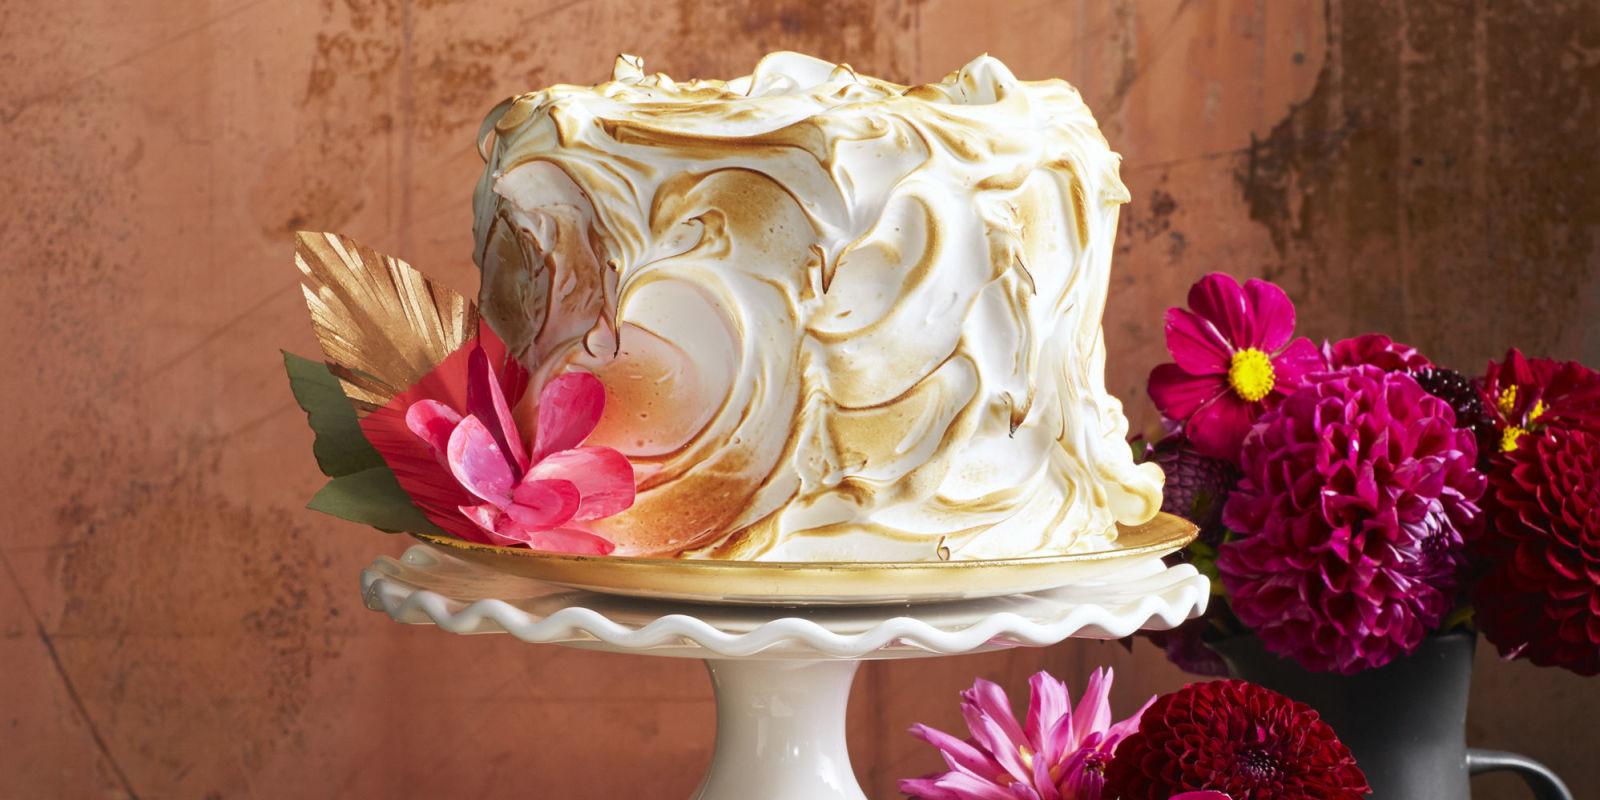 Pumpkin Spice Cake